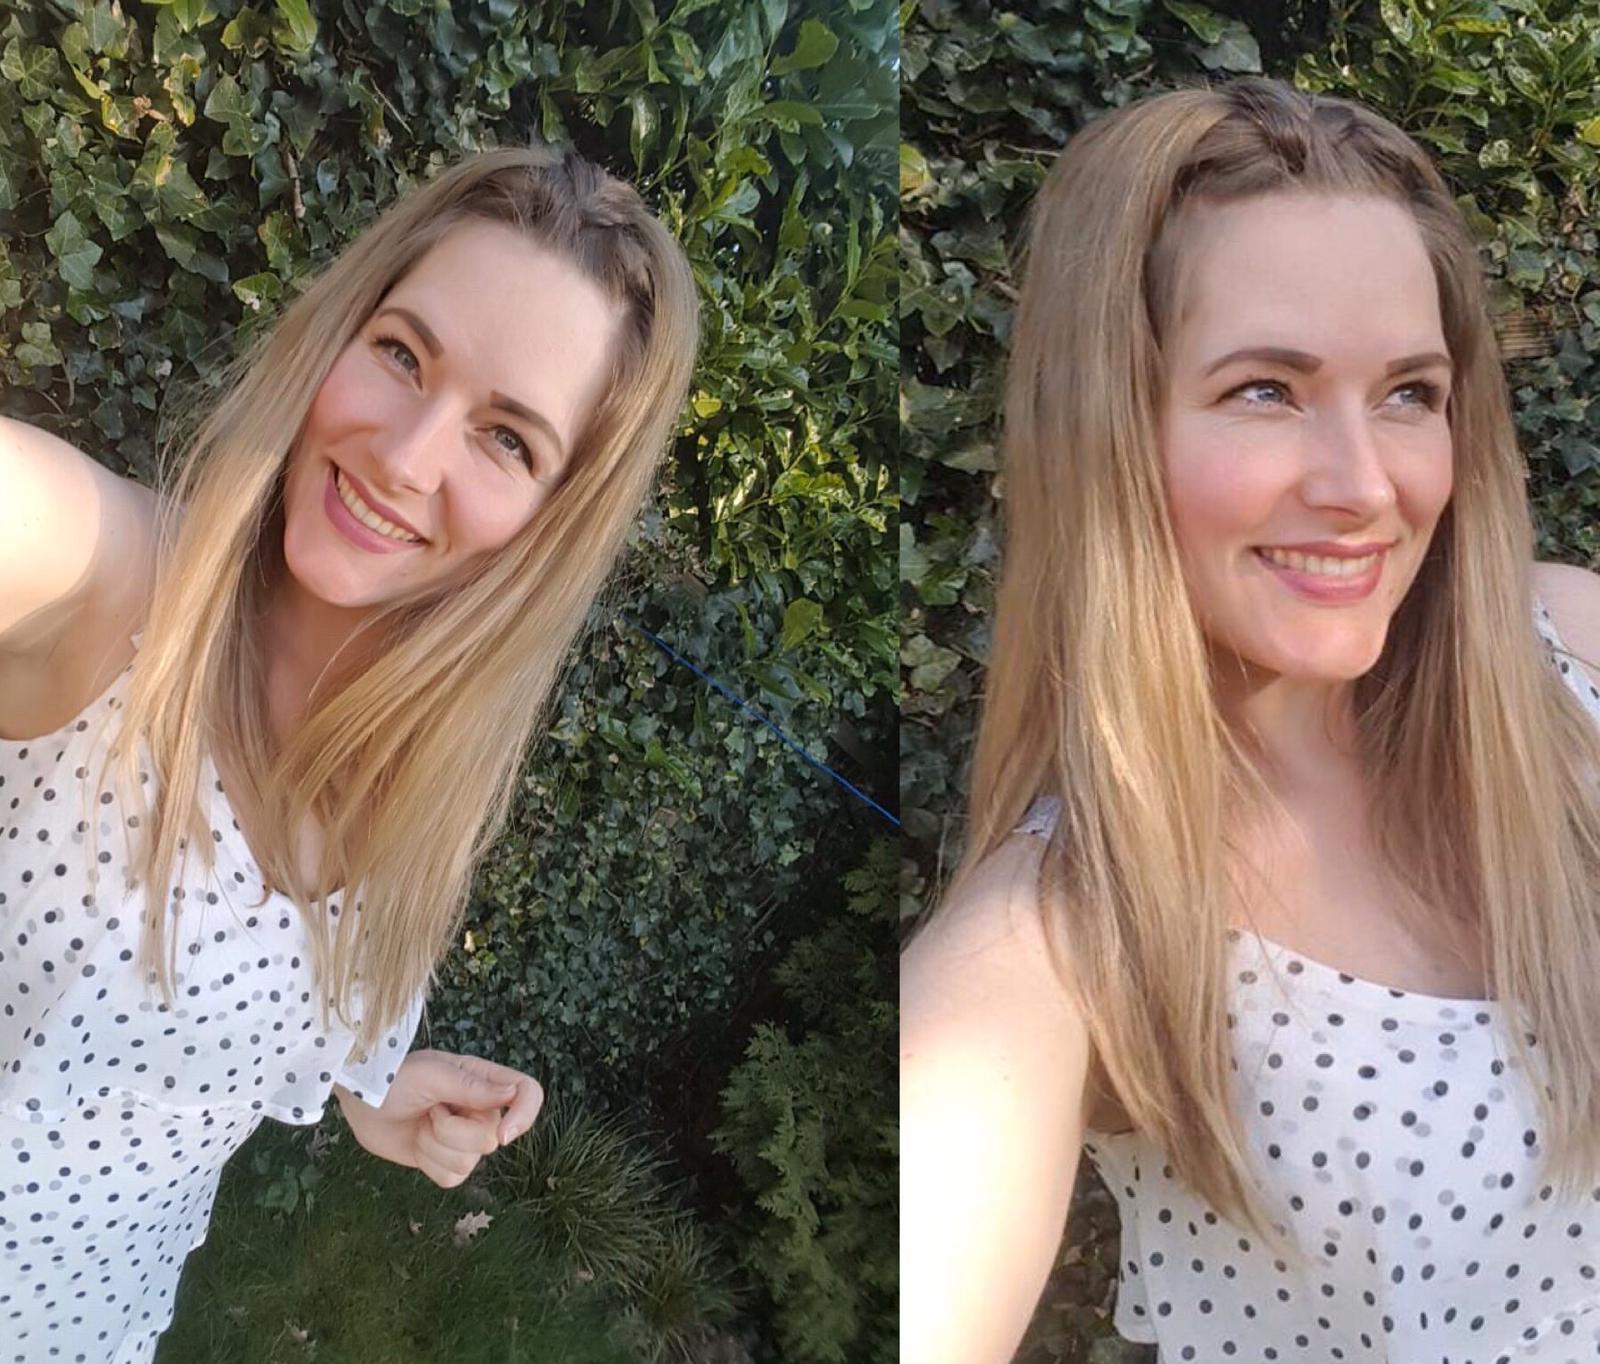 hair topper for hair loss alopecia in women